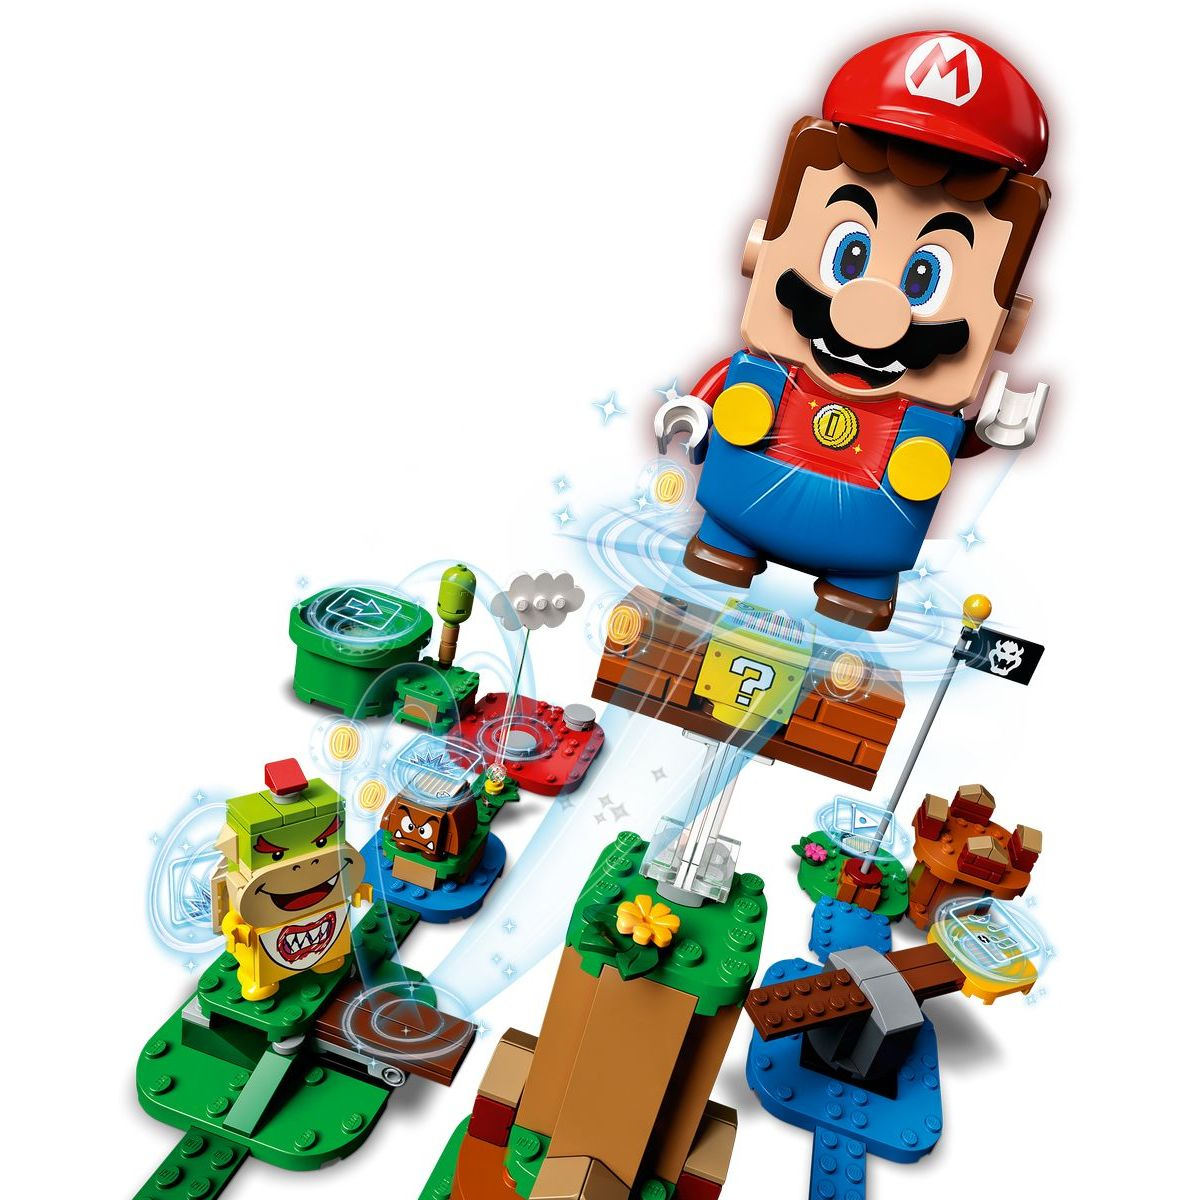 LEGO Super Mario 71360 Dobrodružství s Mariem startovací set